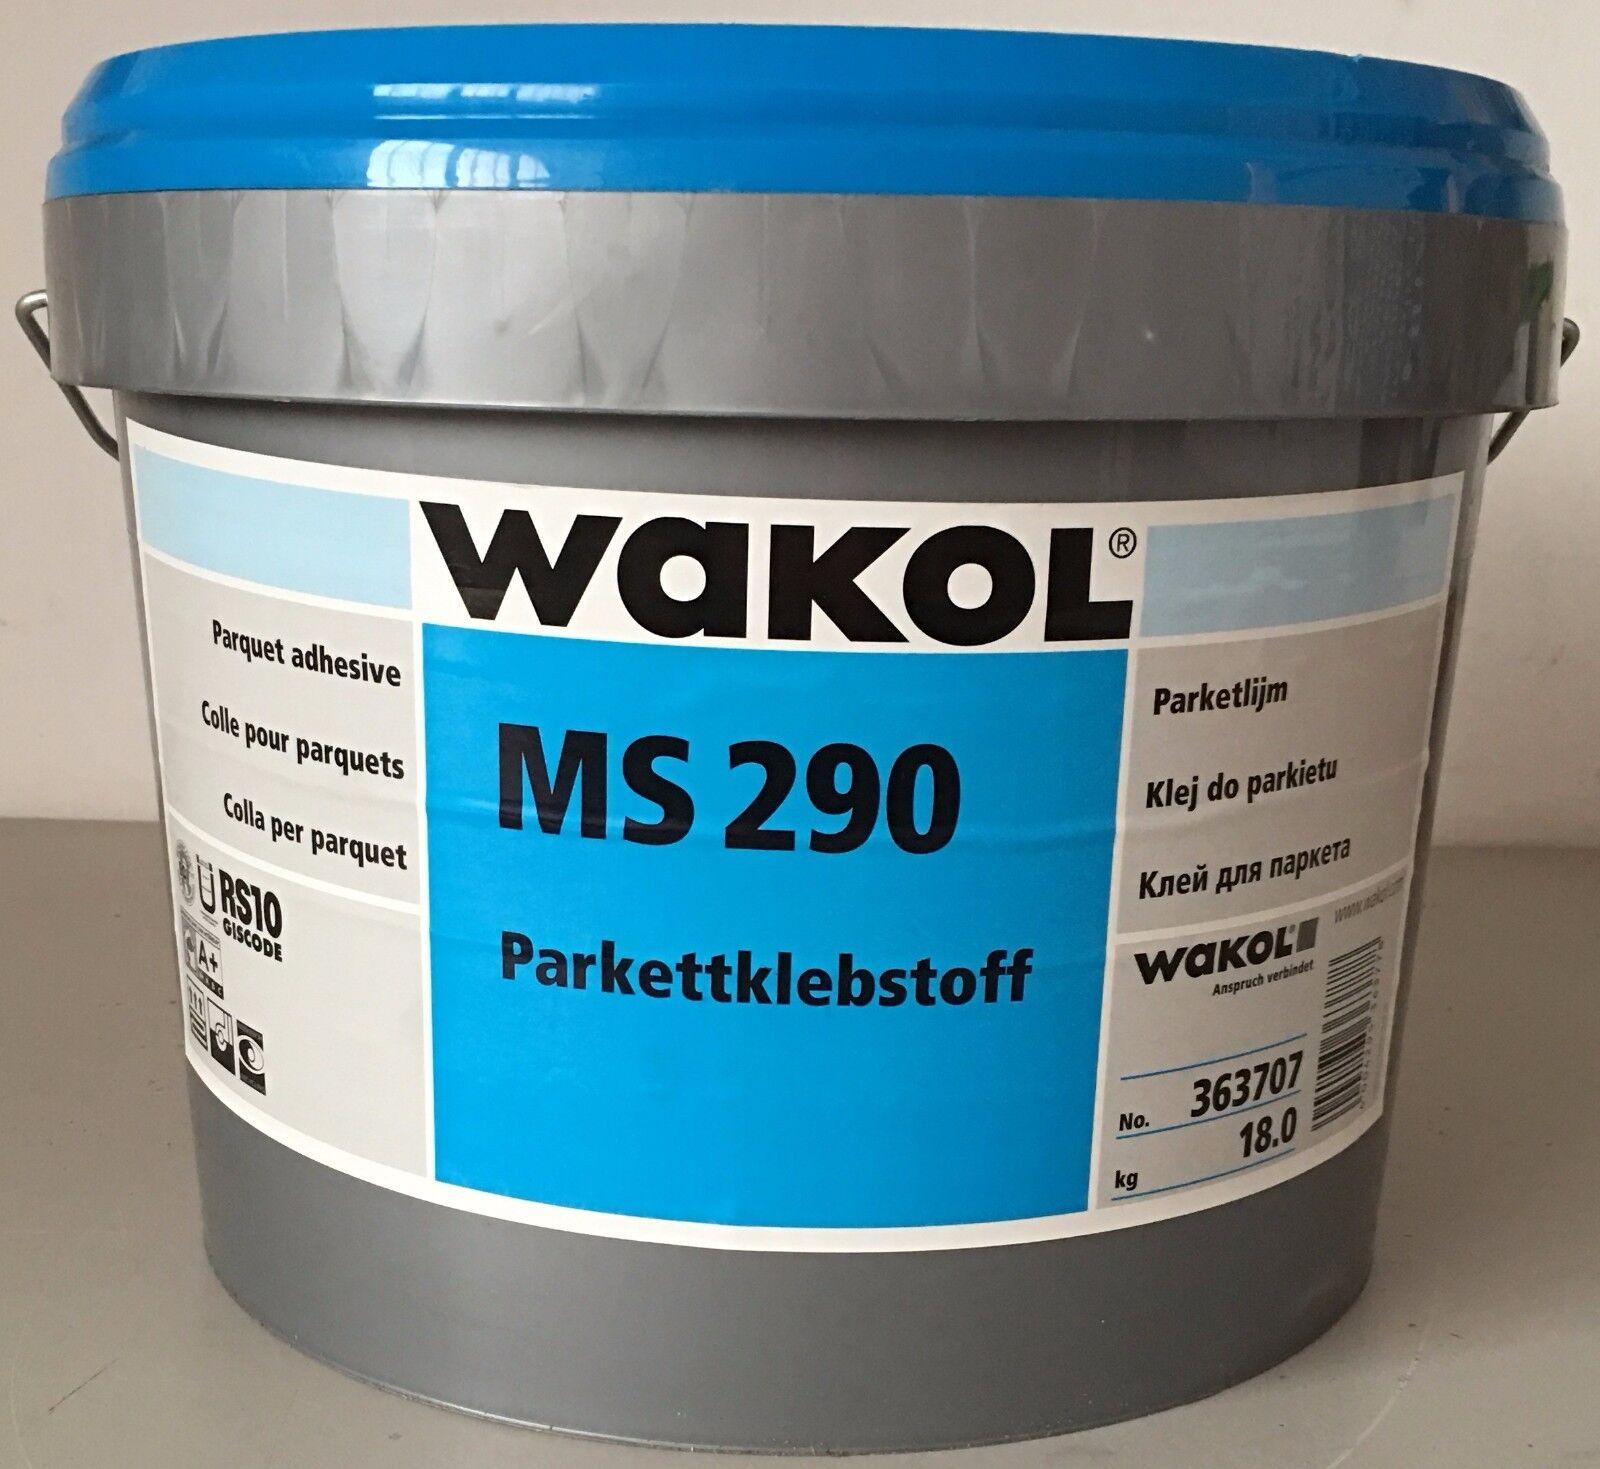 Parkettkleber 5 x 18 kg Wakol MS 290 schubfest Klebstoff Massivparkett